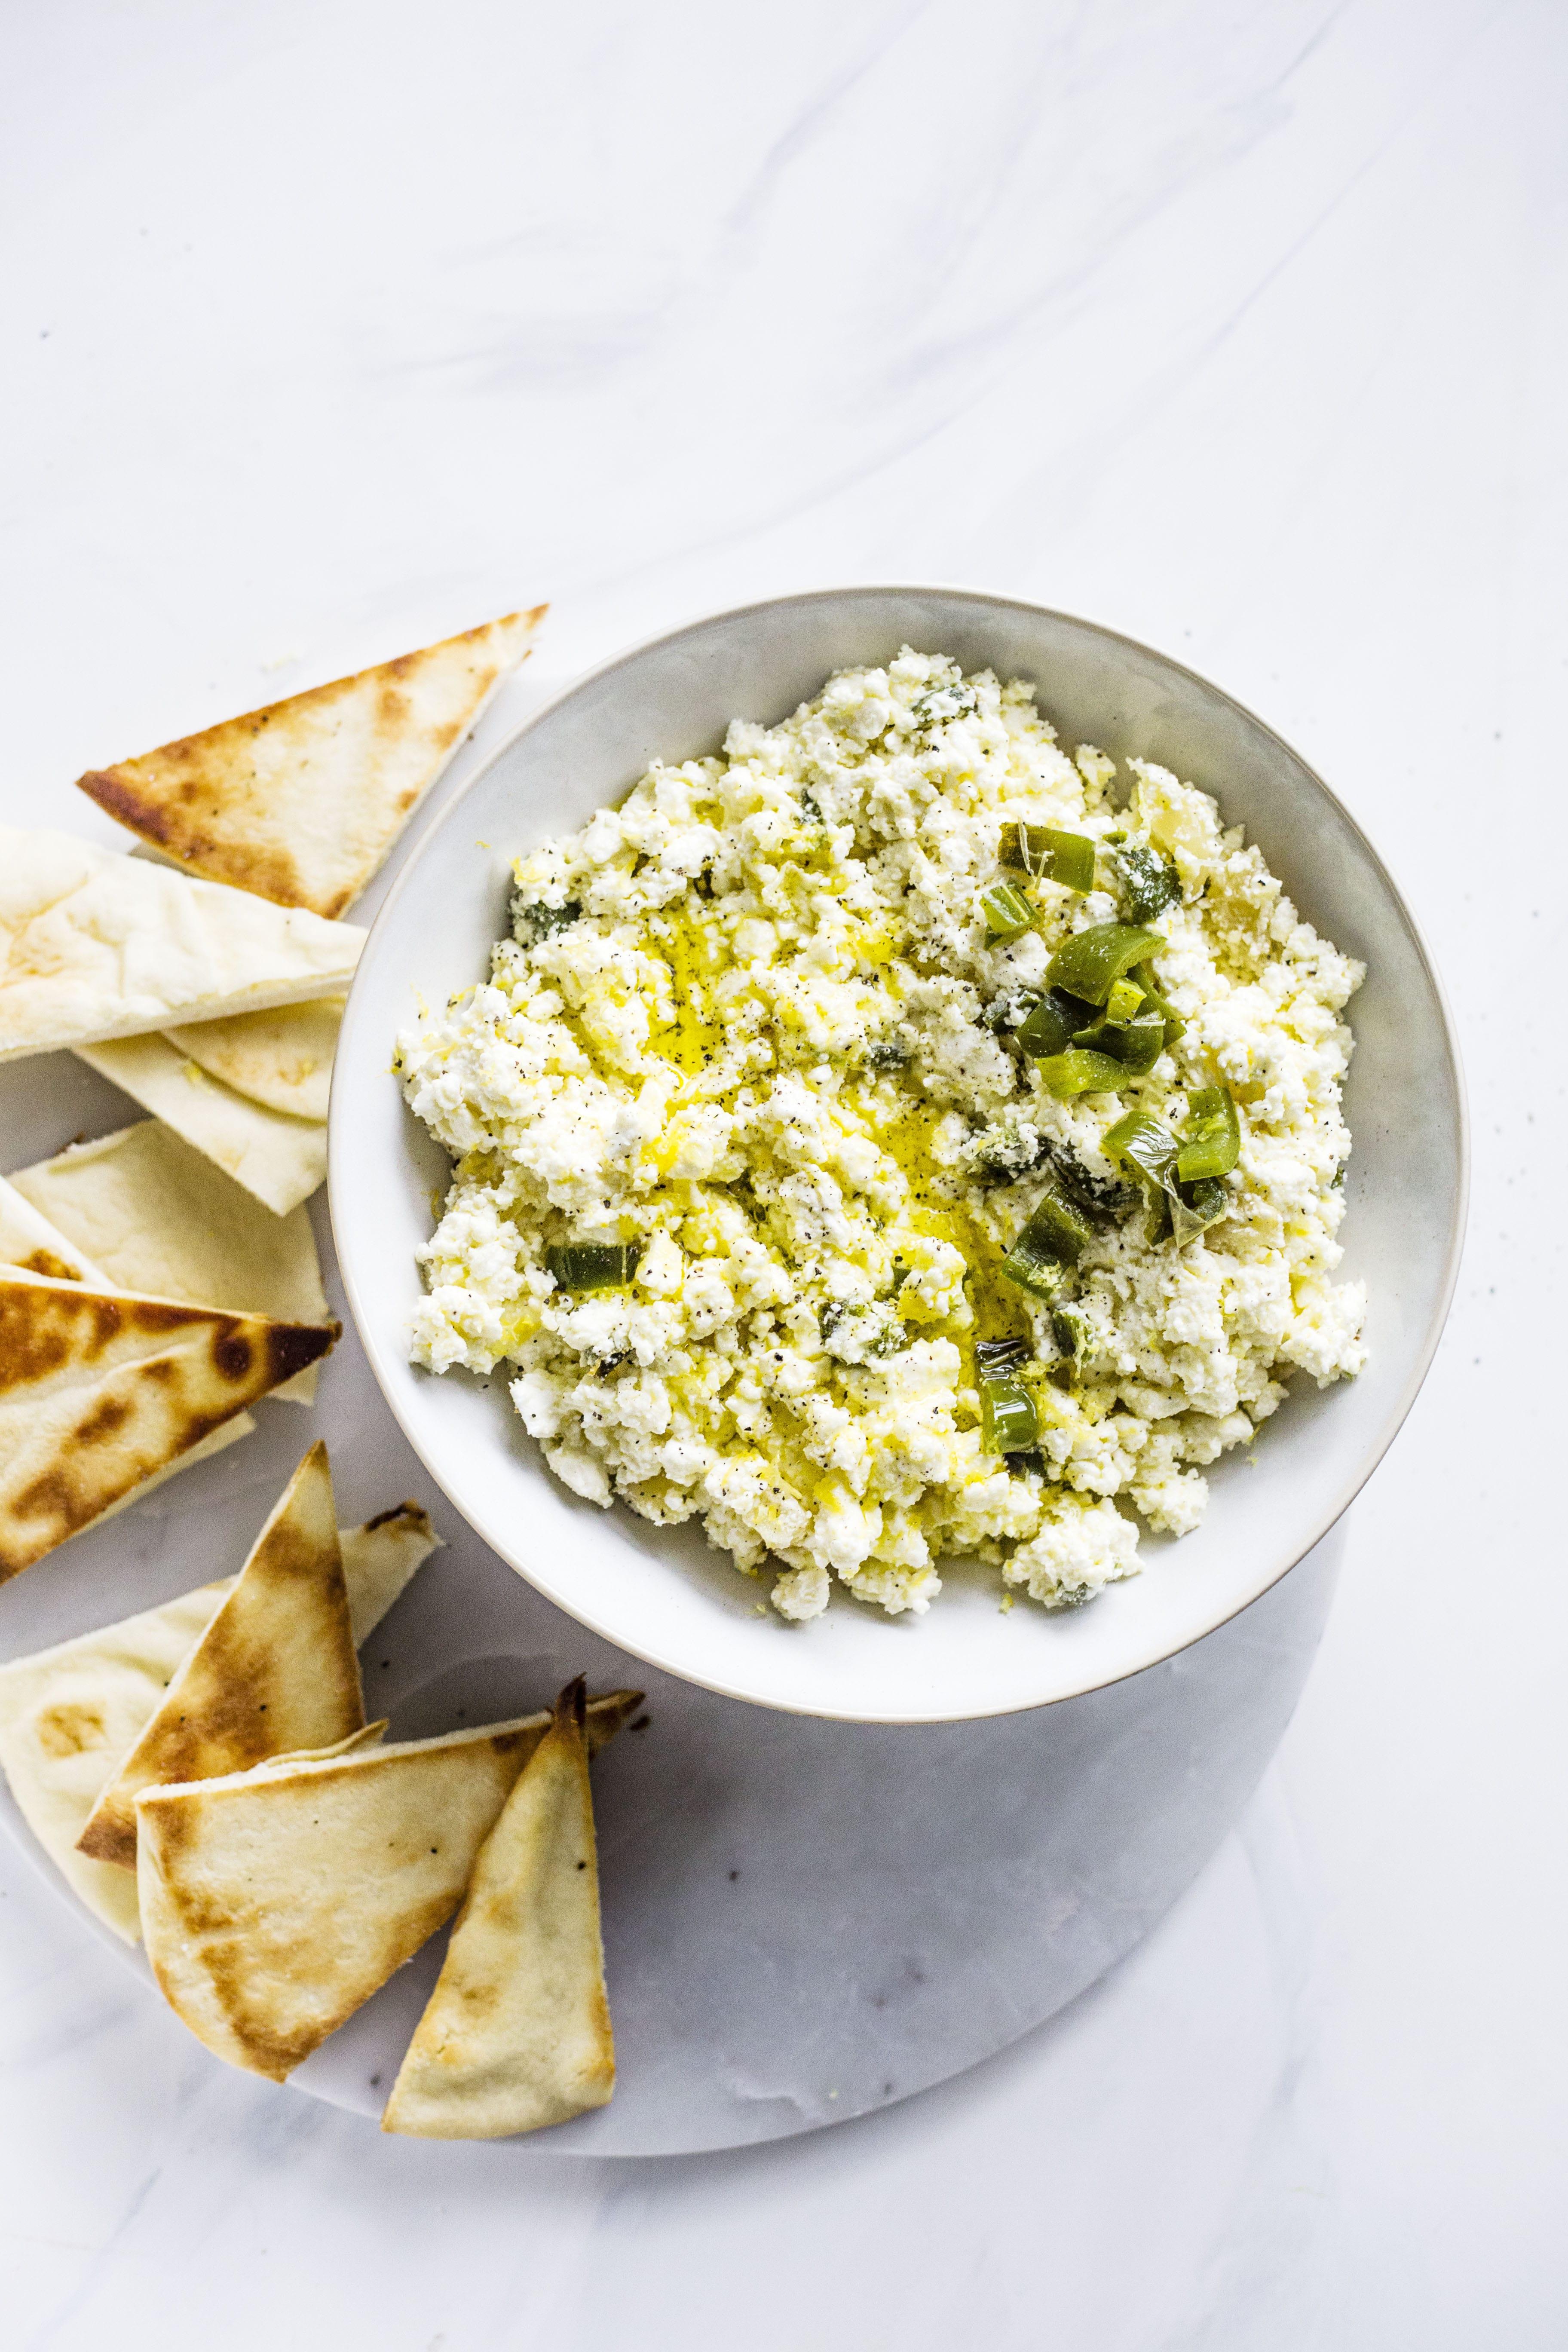 creamy feta dip (aka, crazy feta!) I howsweeteats.com #feta #dip #appetizer #recipes #cheese